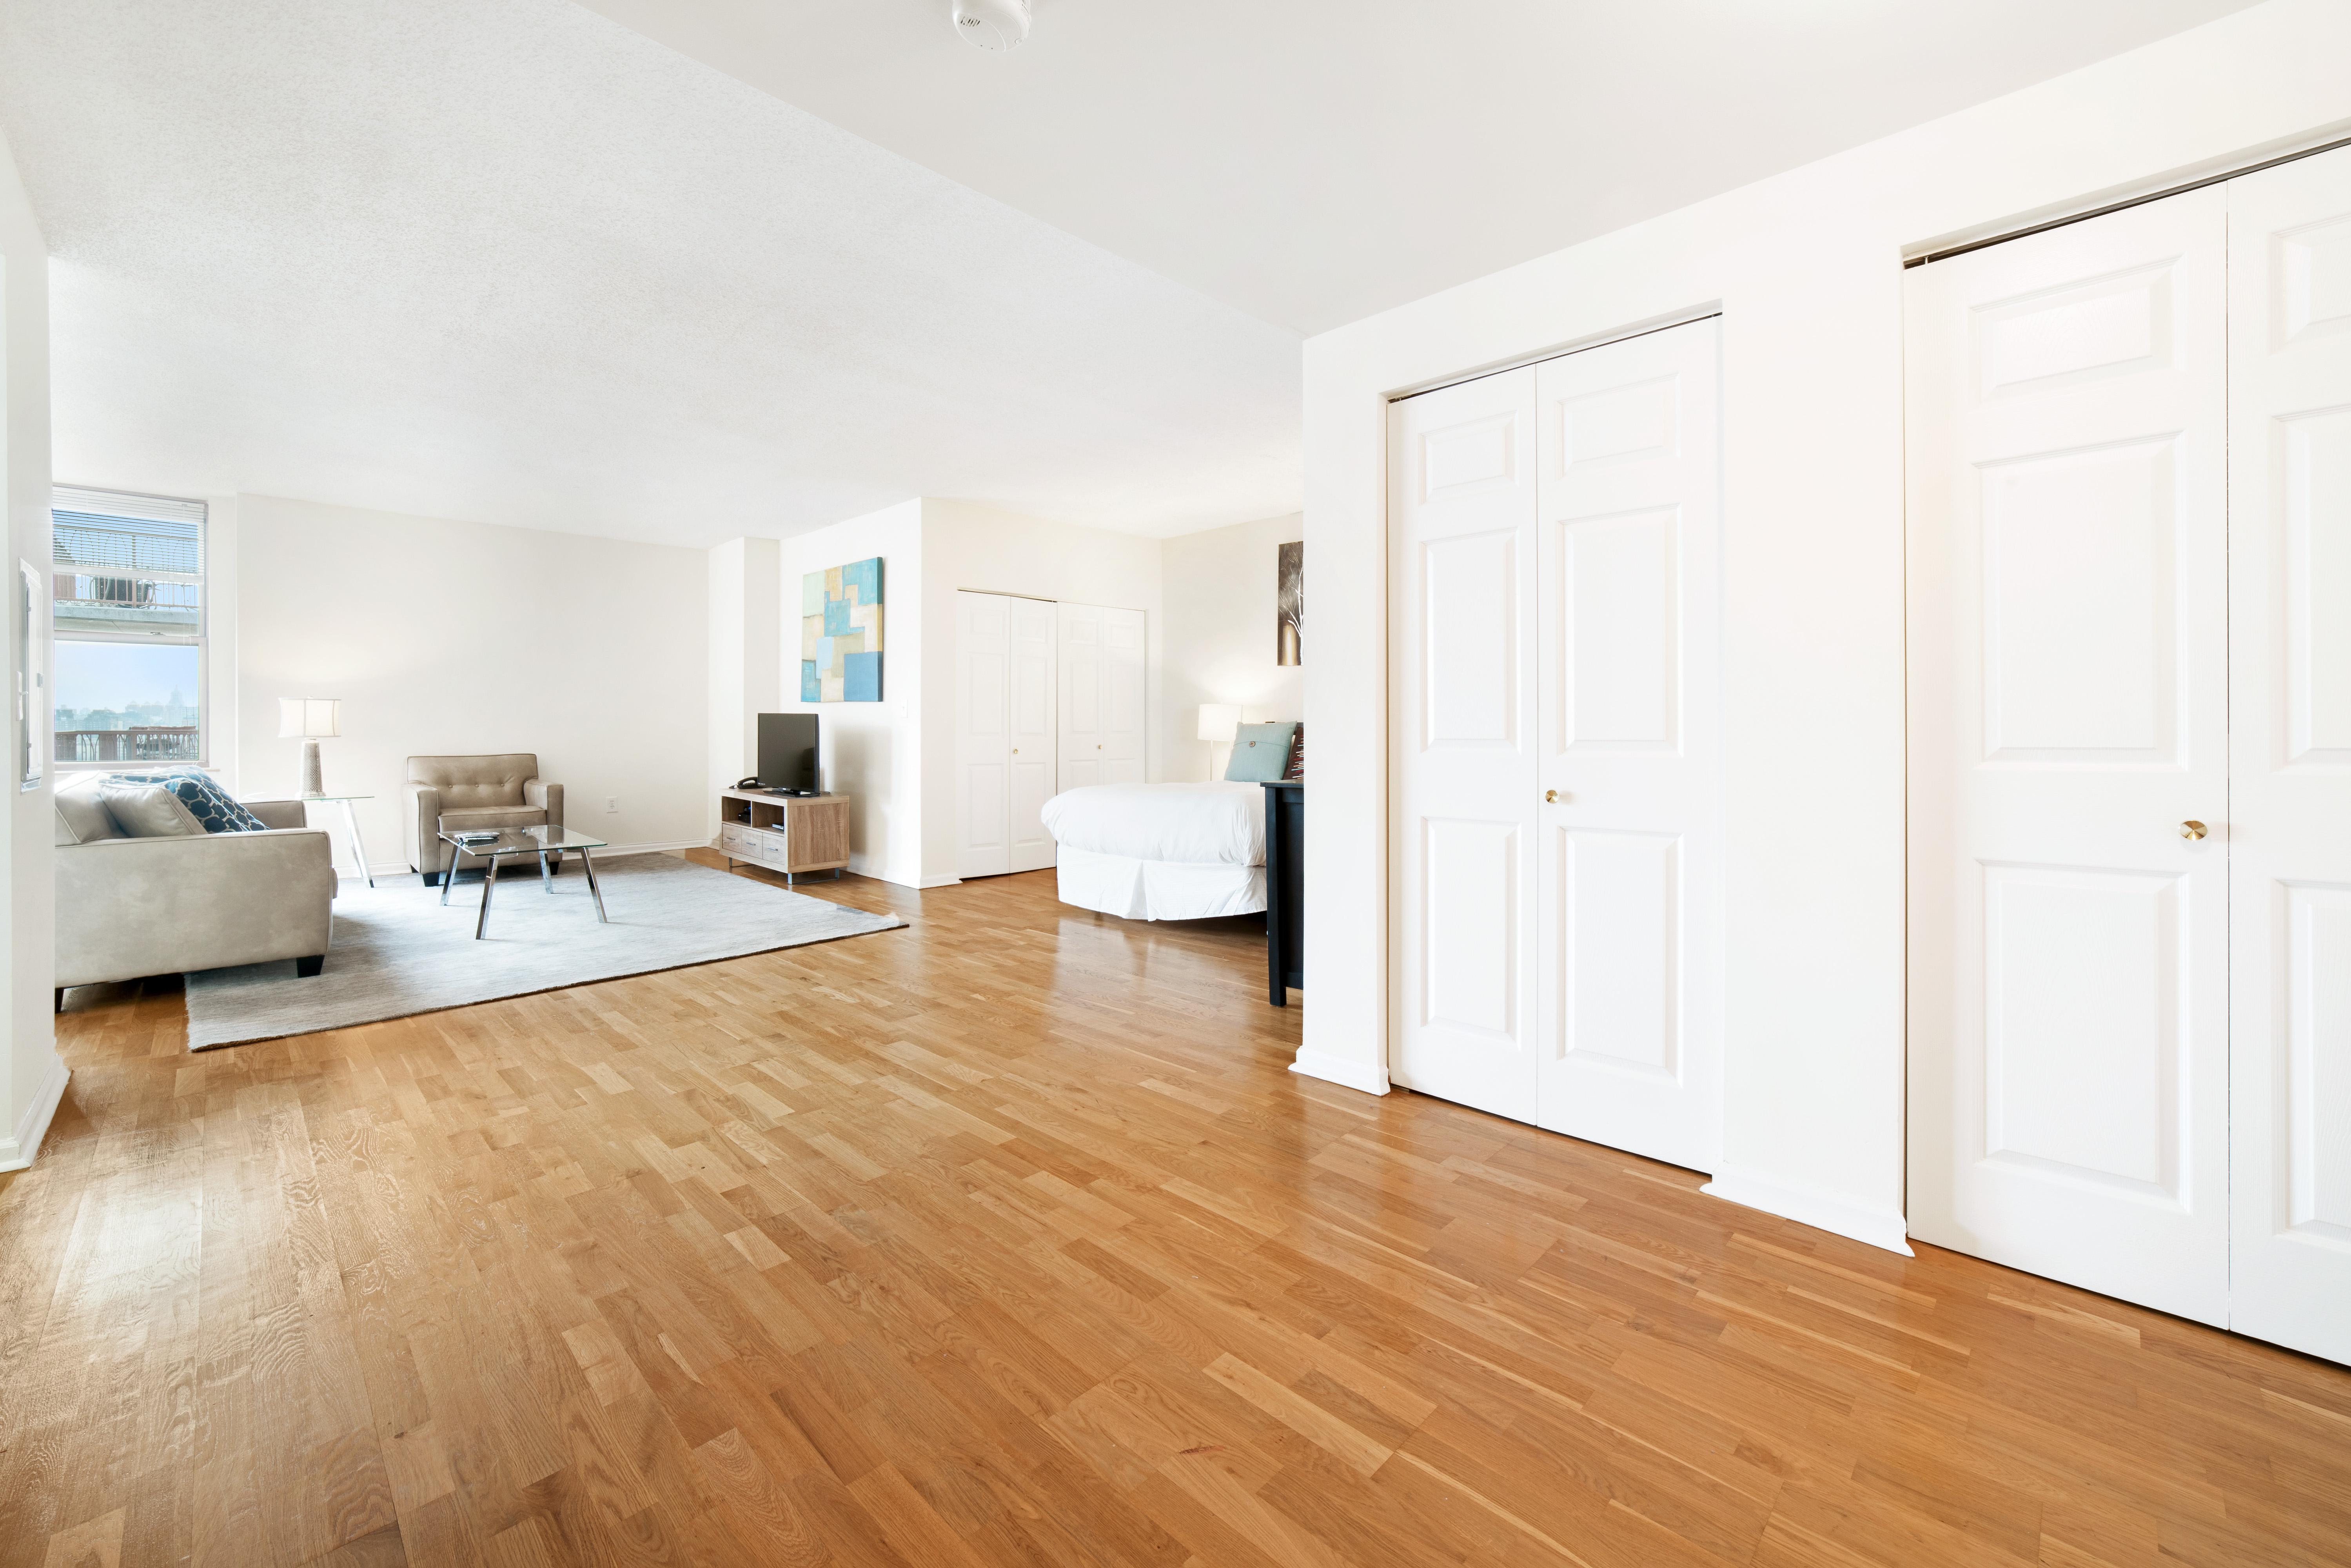 image 3 furnished 1 bedroom Apartment for rent in Hoboken, Hudson County